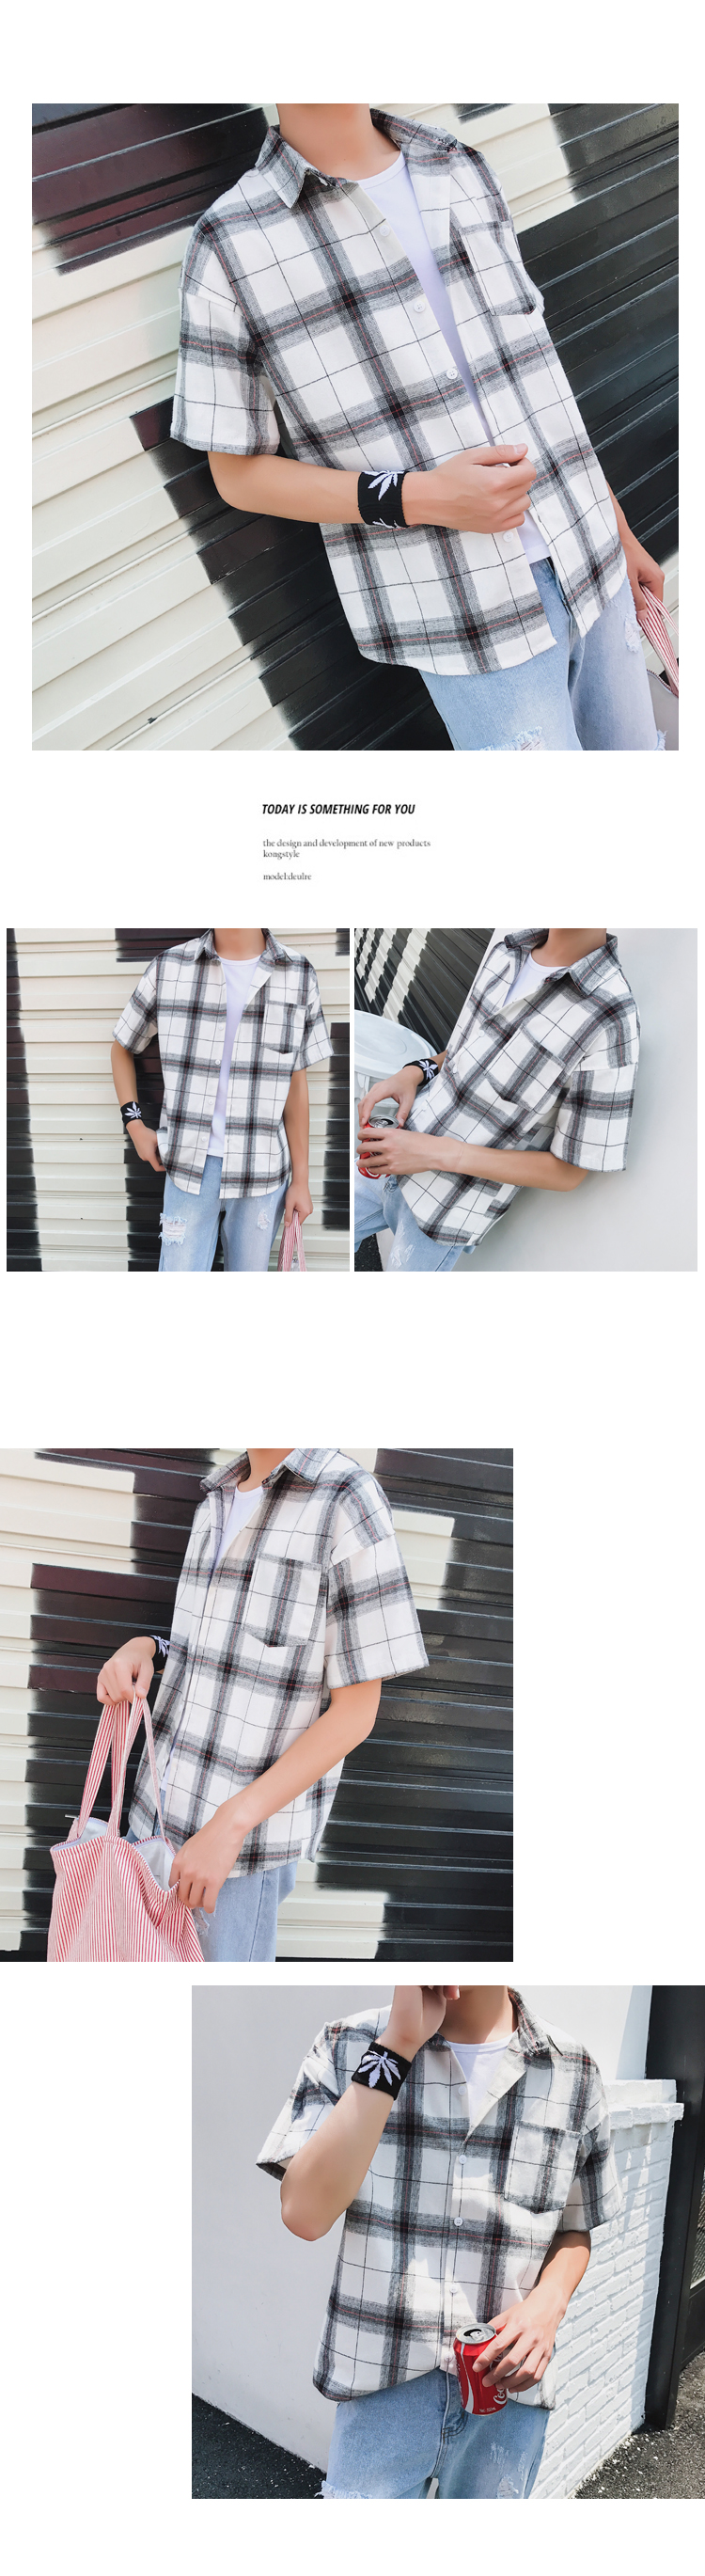 LEGIBLE Men Plaid Short Shirts 2019 Mens Harajuku Streetwear Casual Loose Hip Hop Half Sleeve Shirt Male Fashion 13